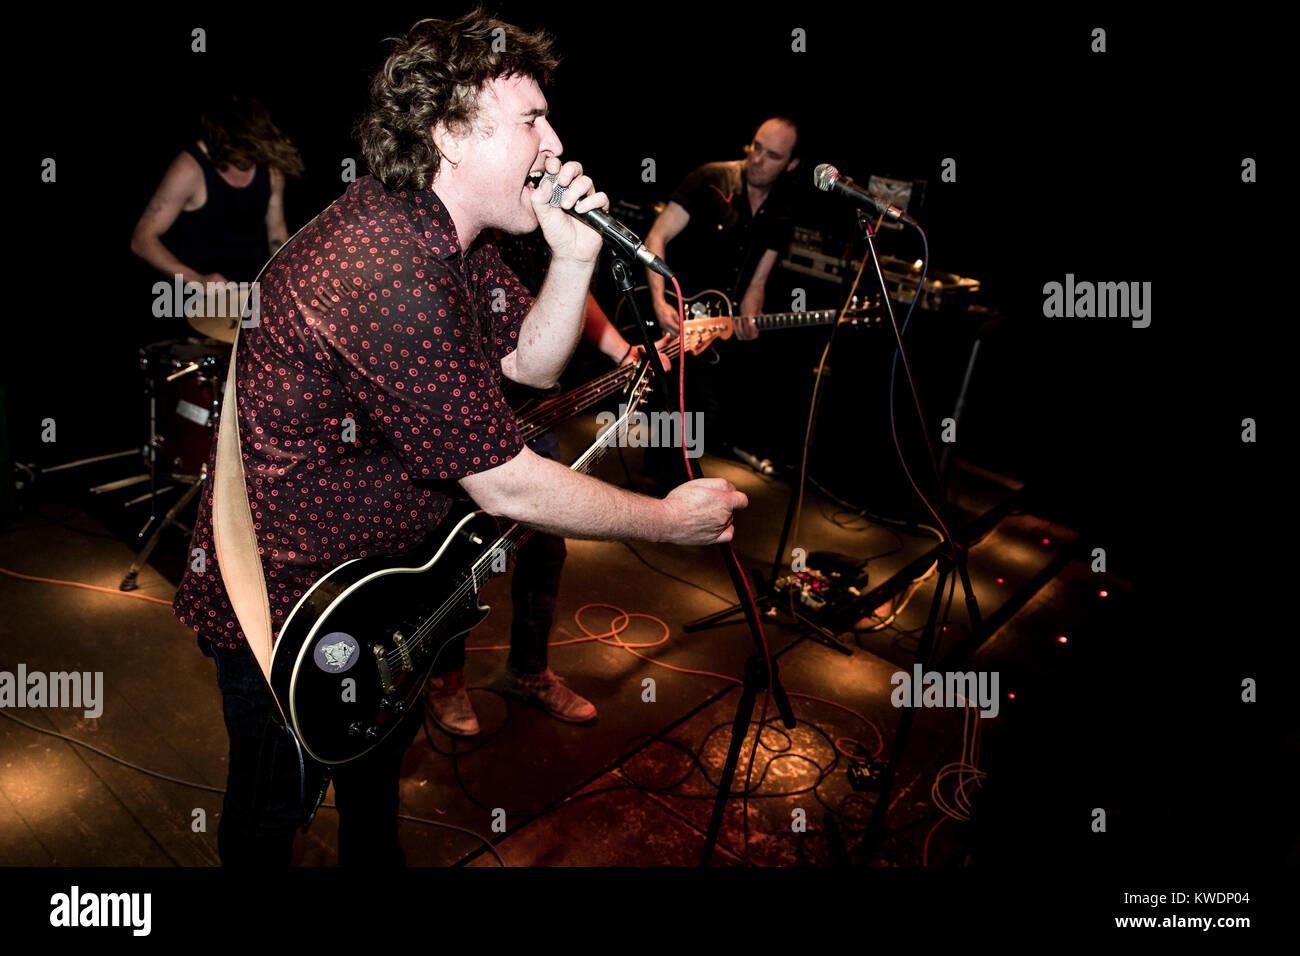 Barcelona, Spain. October 27, 2017. Concert by James McCann in Marula Café. Organized by A Wamba Buluba. Photographer: - Stock Image